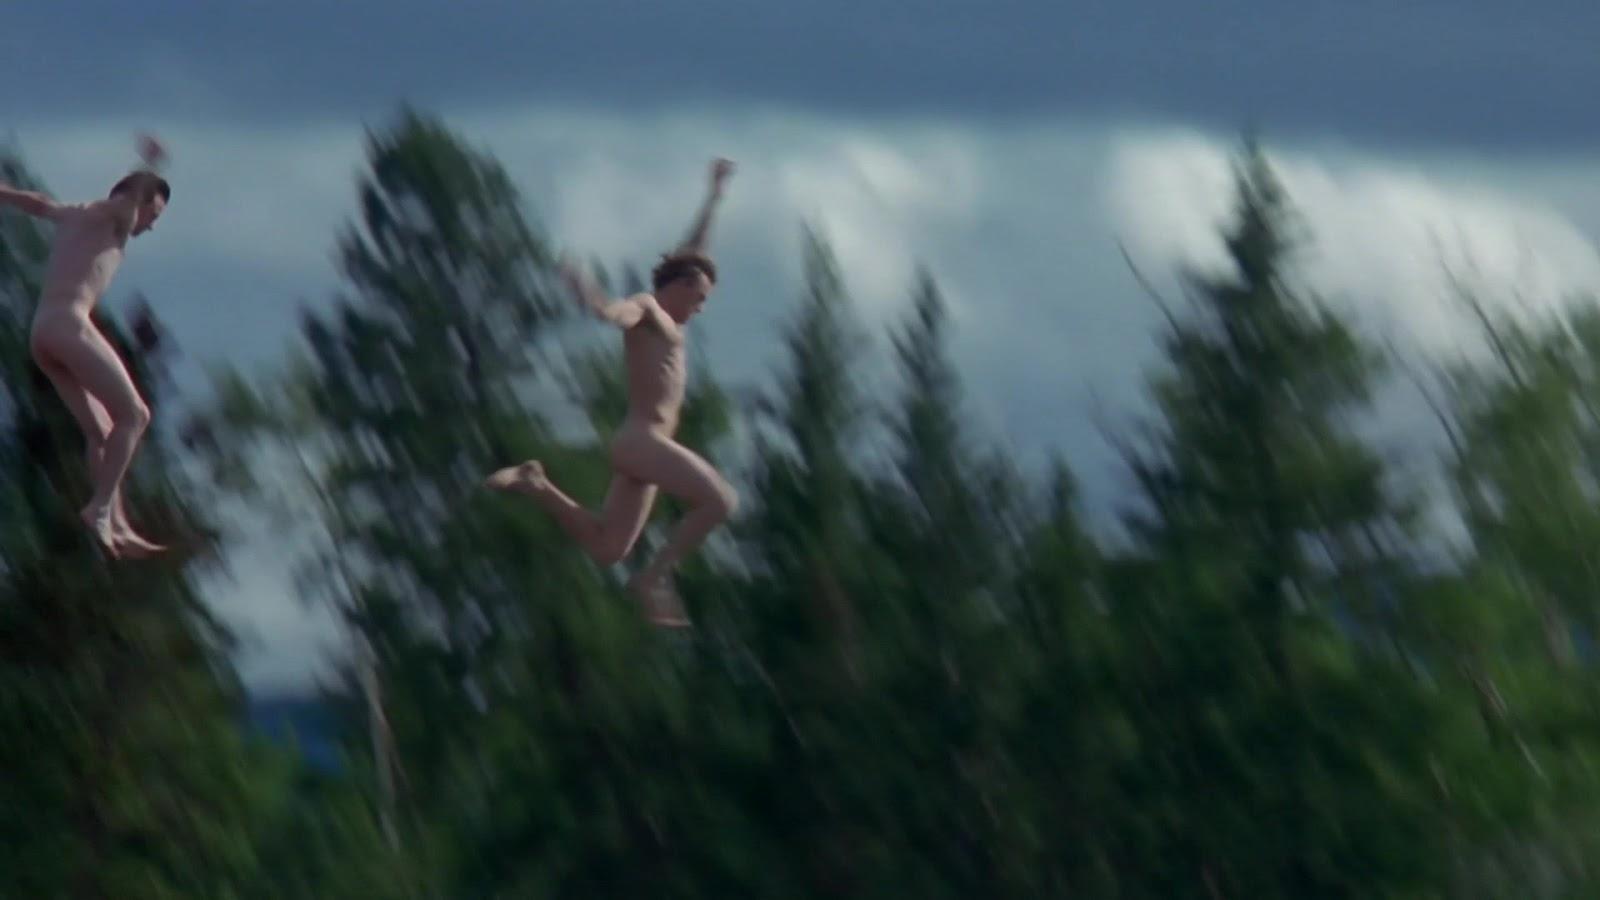 Jake Gyllenhaal And Heath Ledger Sex Scene